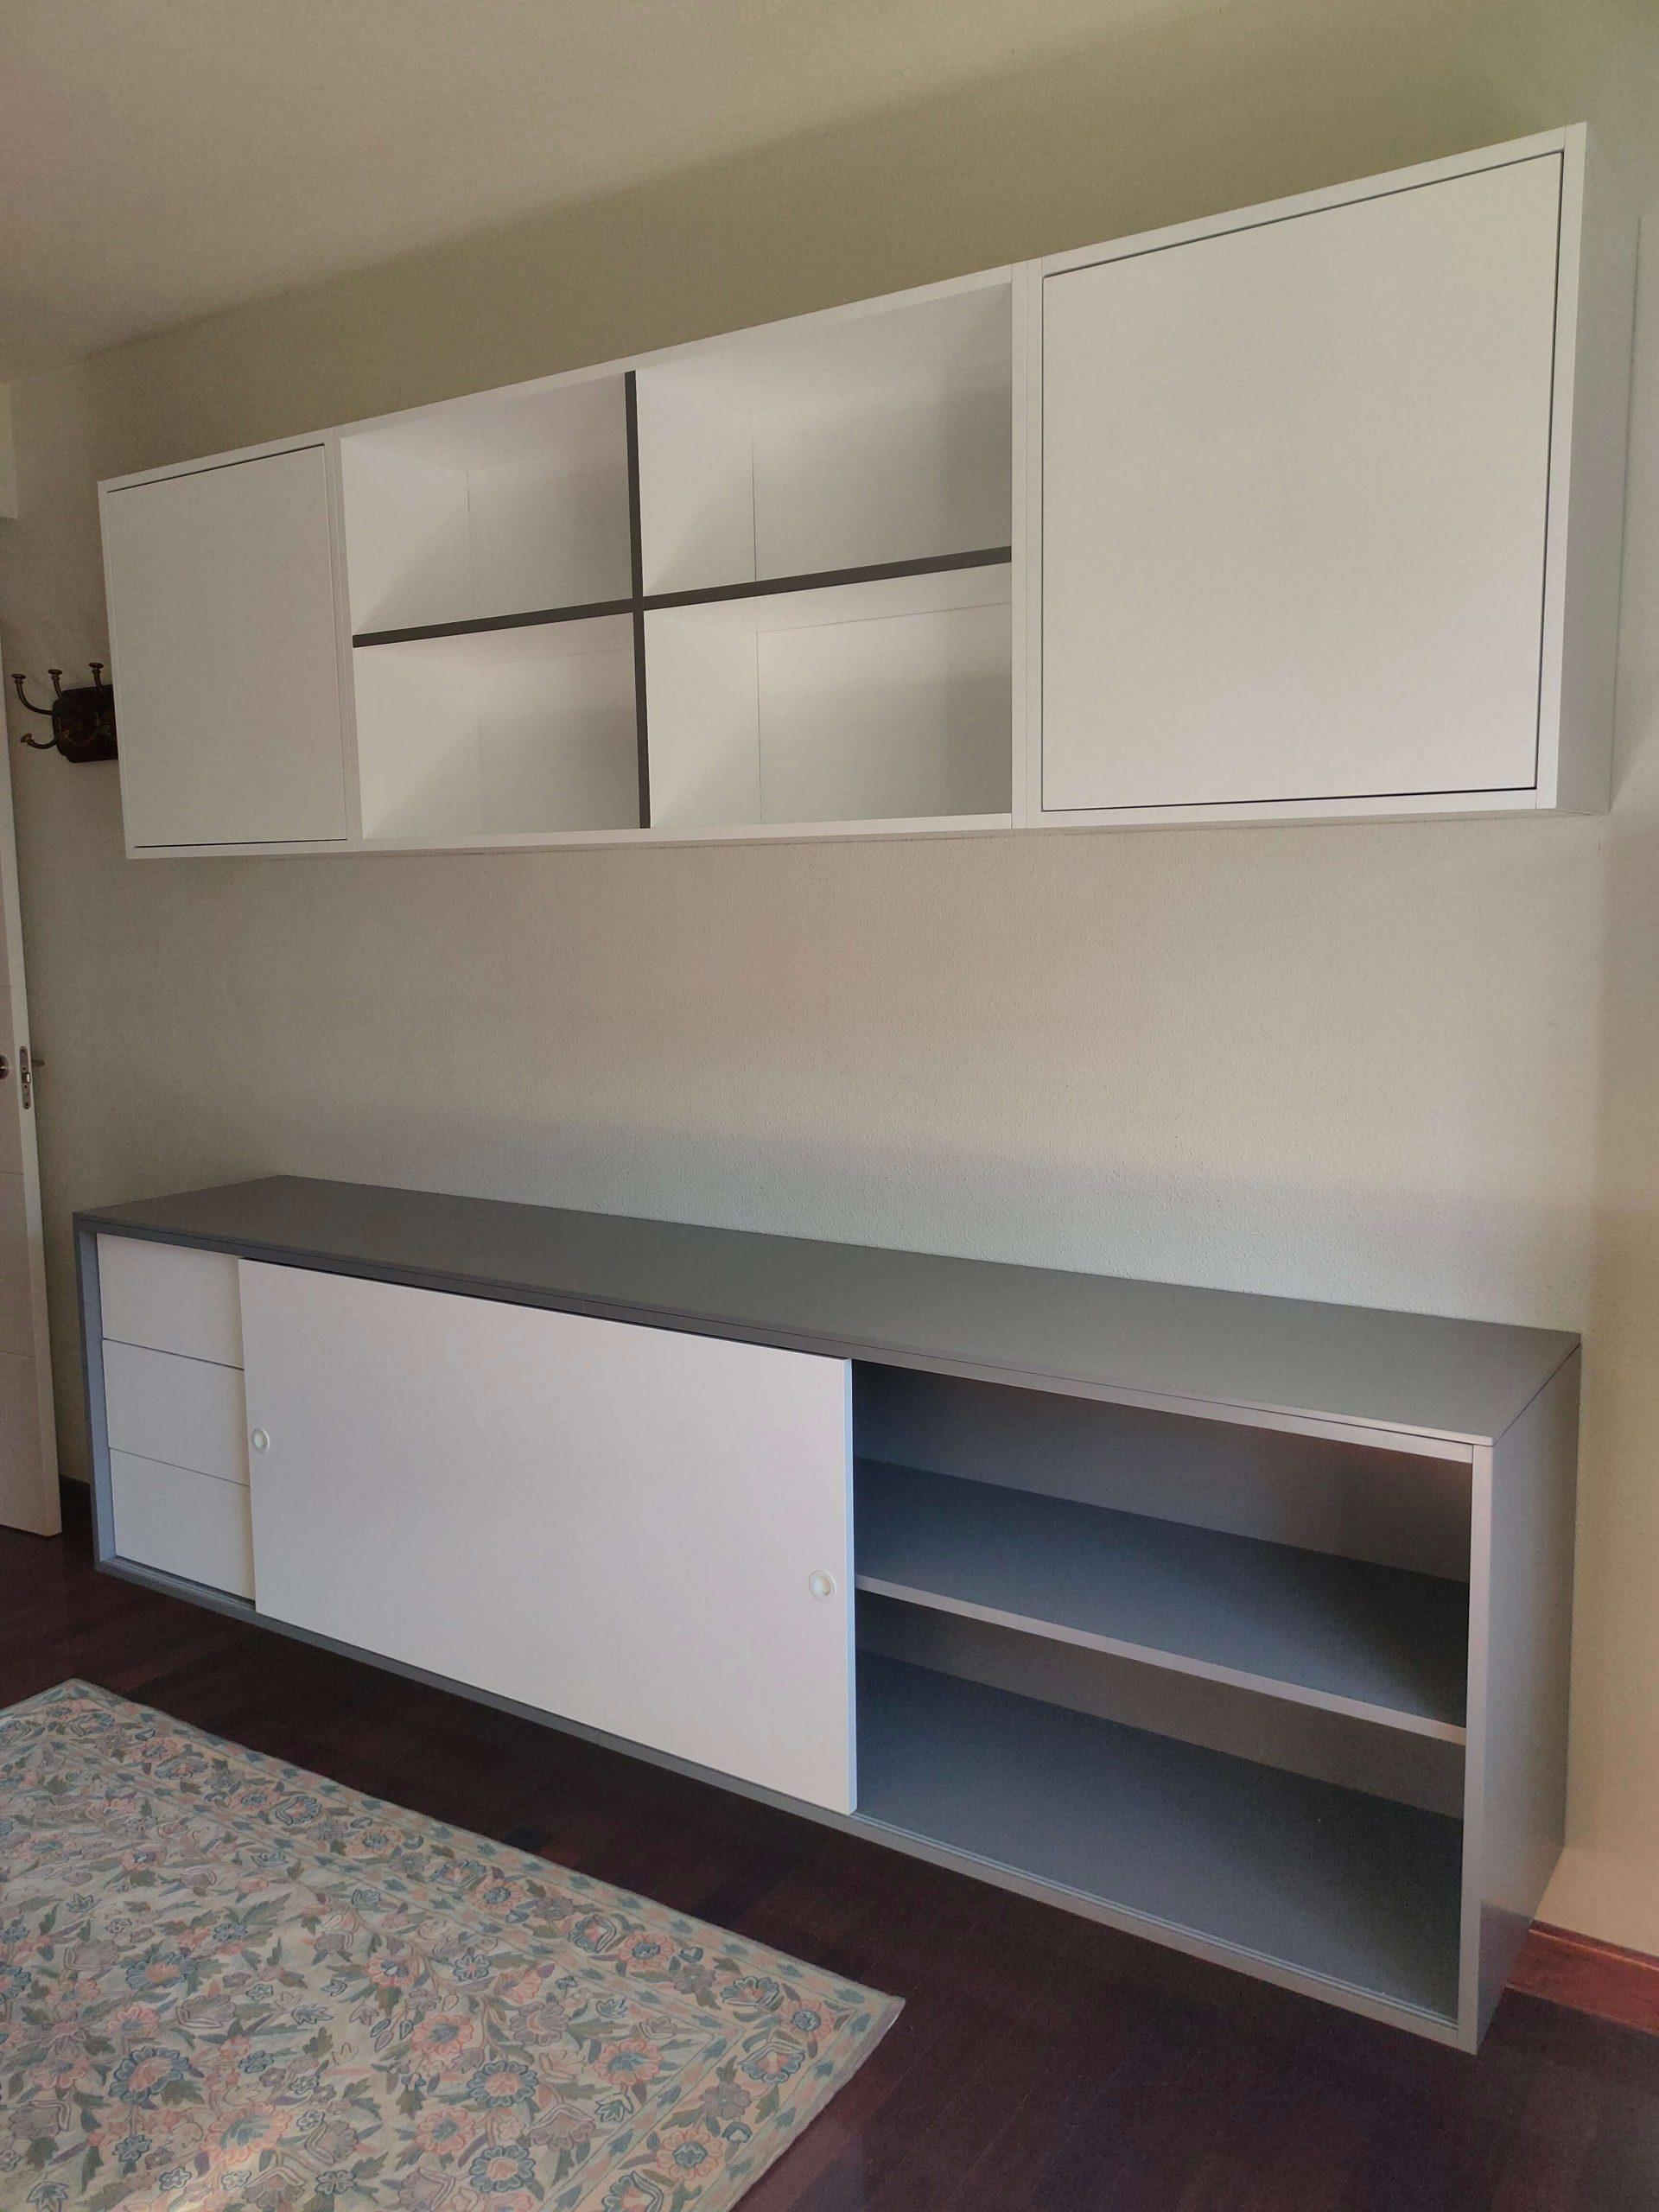 Mumarq Interiorismo y Arquitectura - Diseño de mueble contenedor